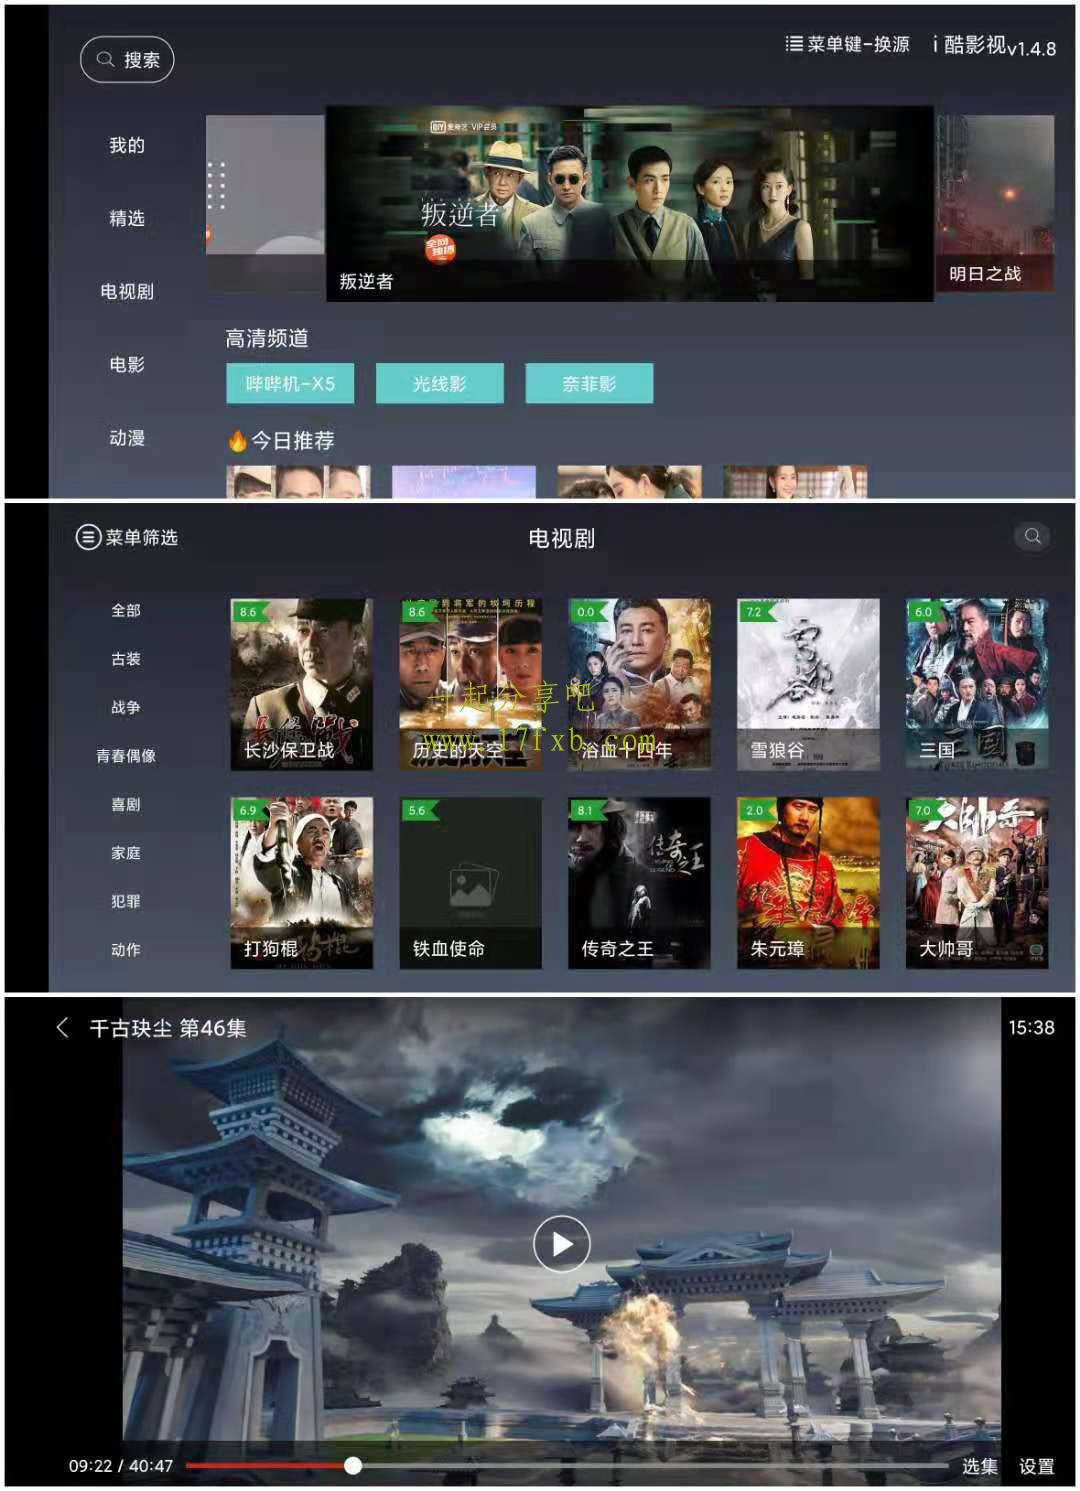 i酷影视 v1.4.8 盒子TV版追剧必备 第1张